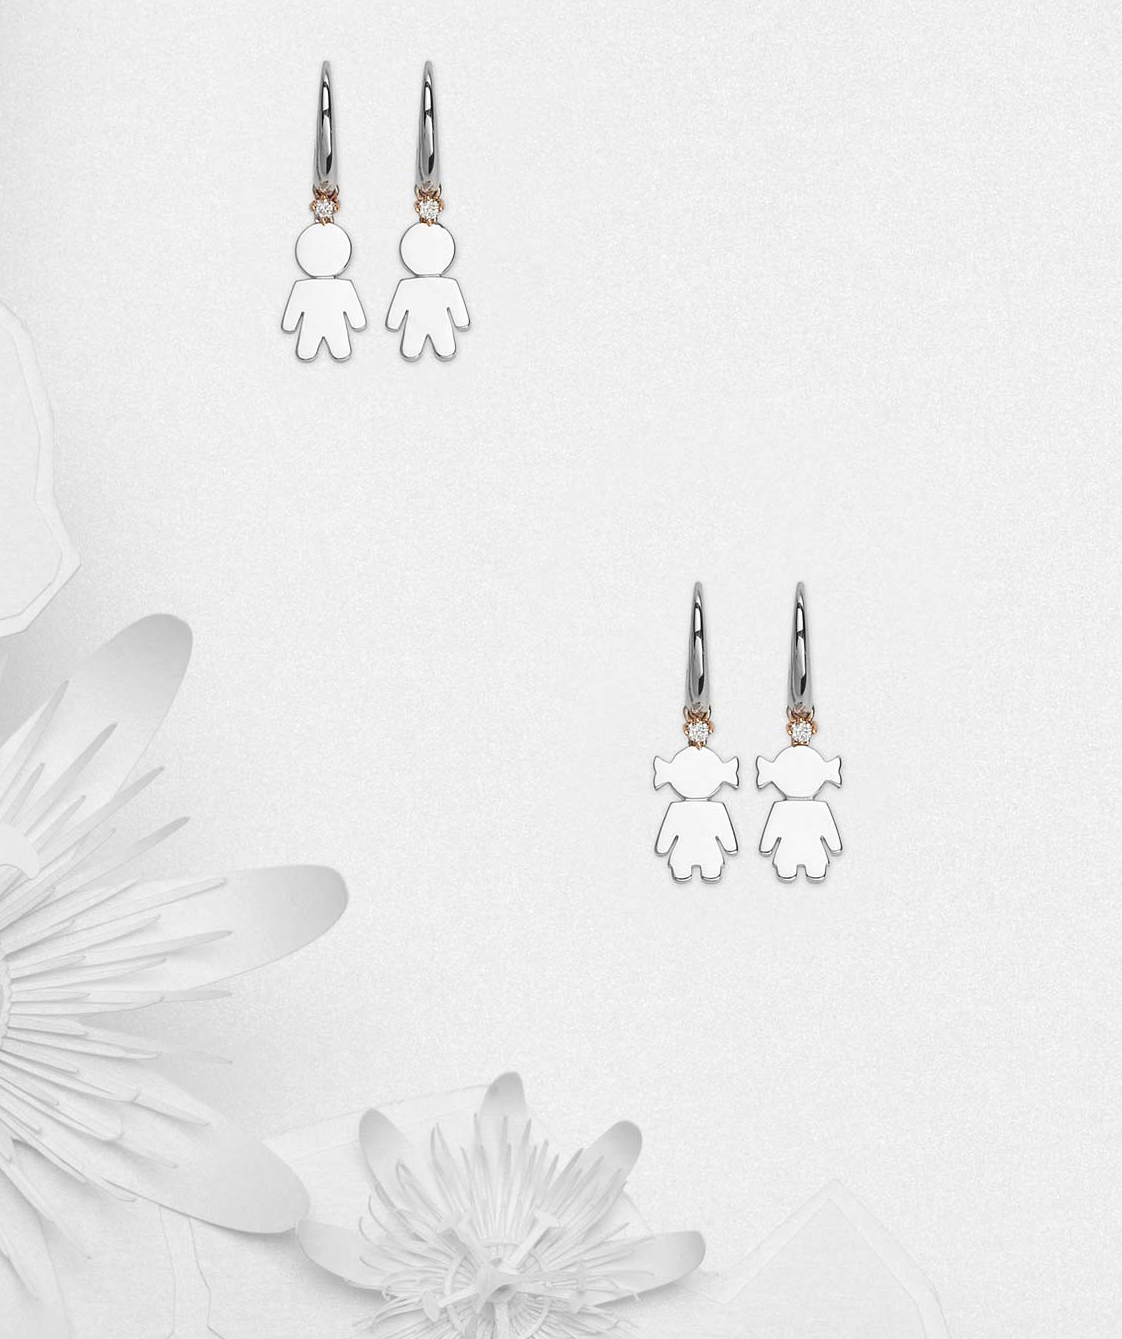 Bimbo Bimba earrings silver and brilliant | Easy - by Crivelli